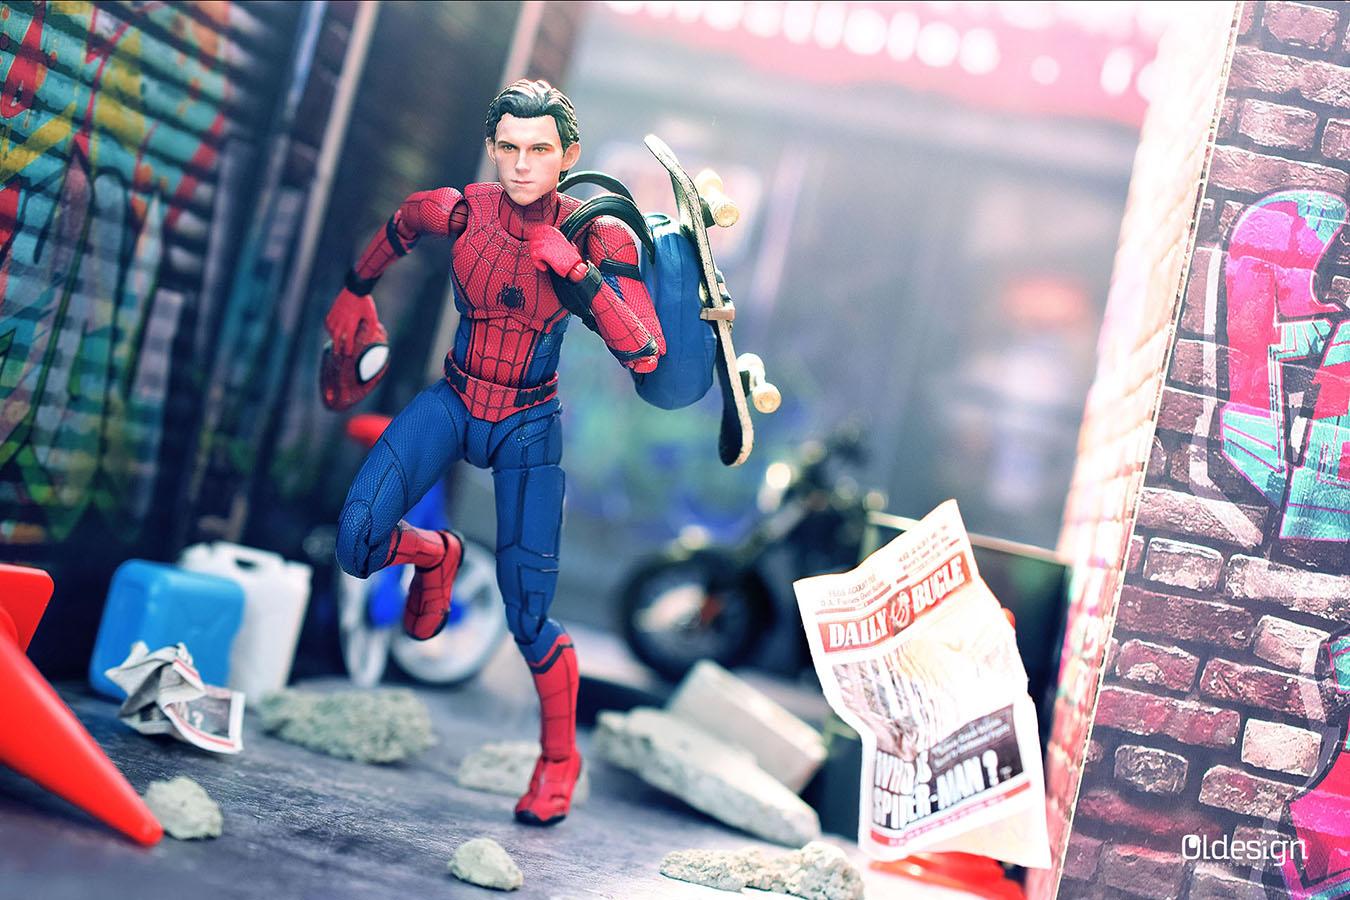 oldesign_spiderman_01